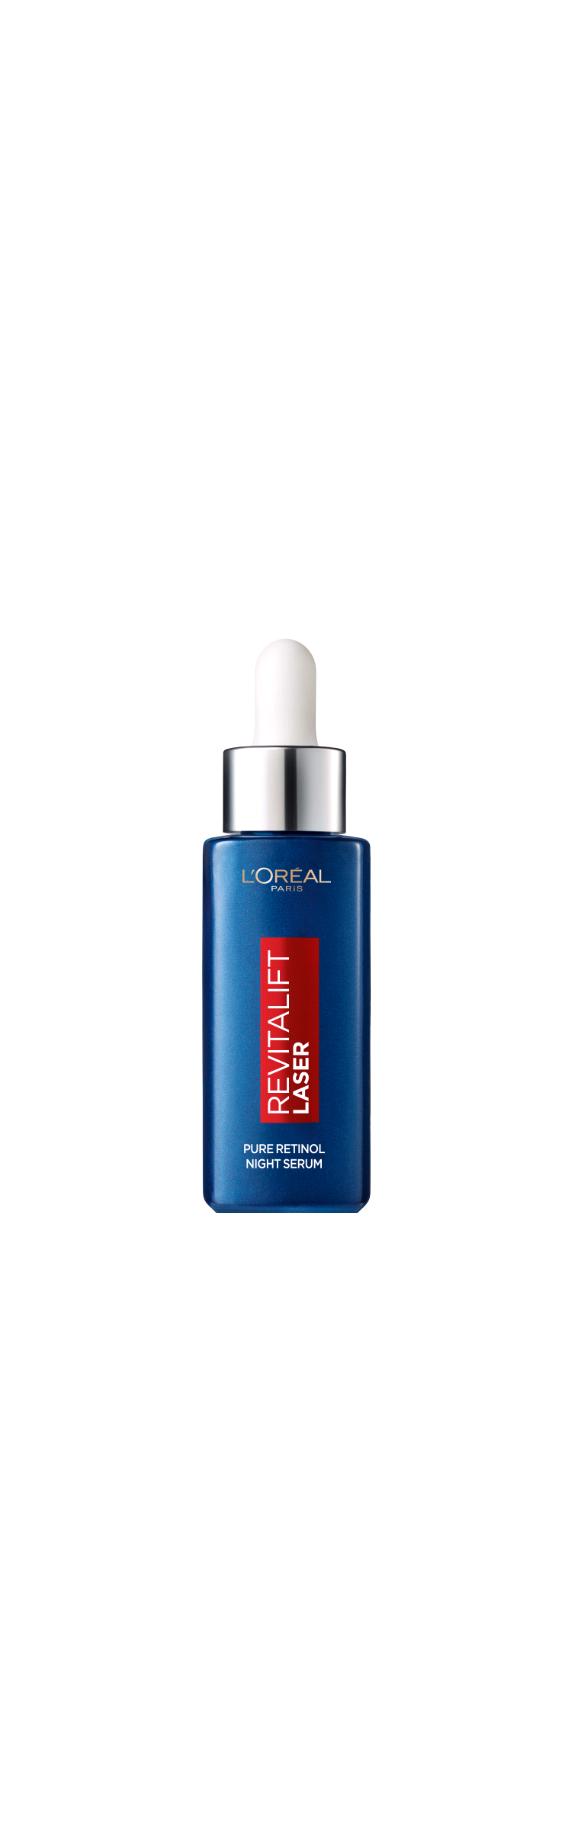 L'Oréal Paris - Revitalift Filler Retinol Night Serum 30 ml